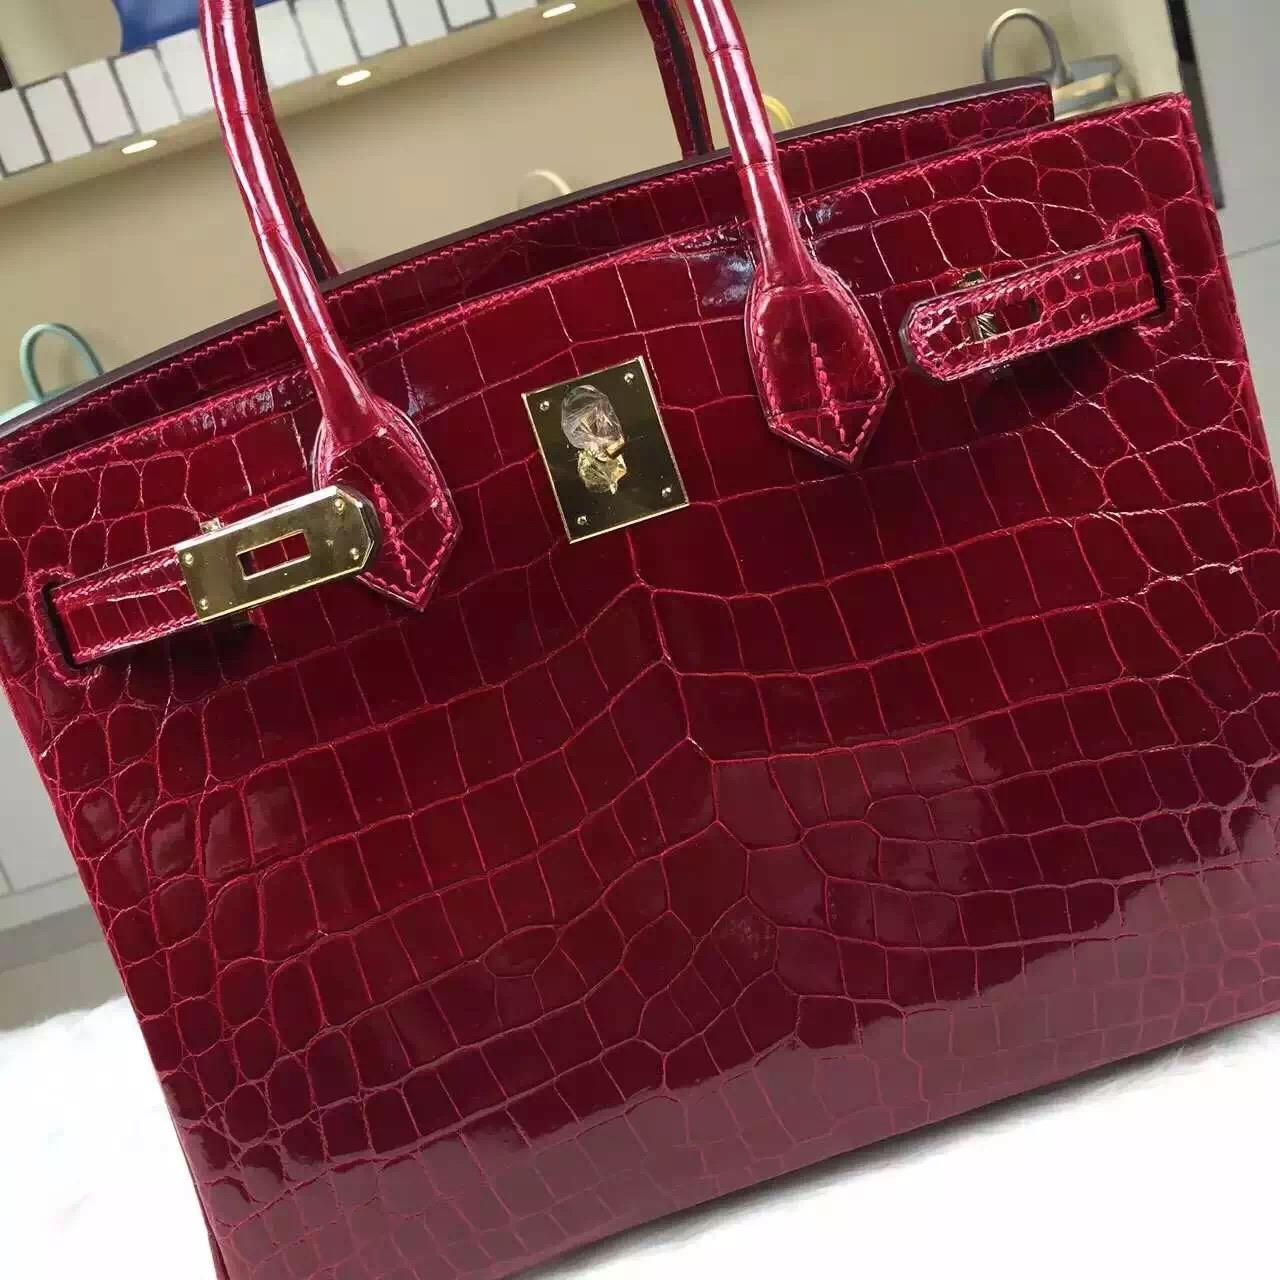 Sale Hermes Crocodile Shiny Leather Birkin30 CK55 Hermes Red